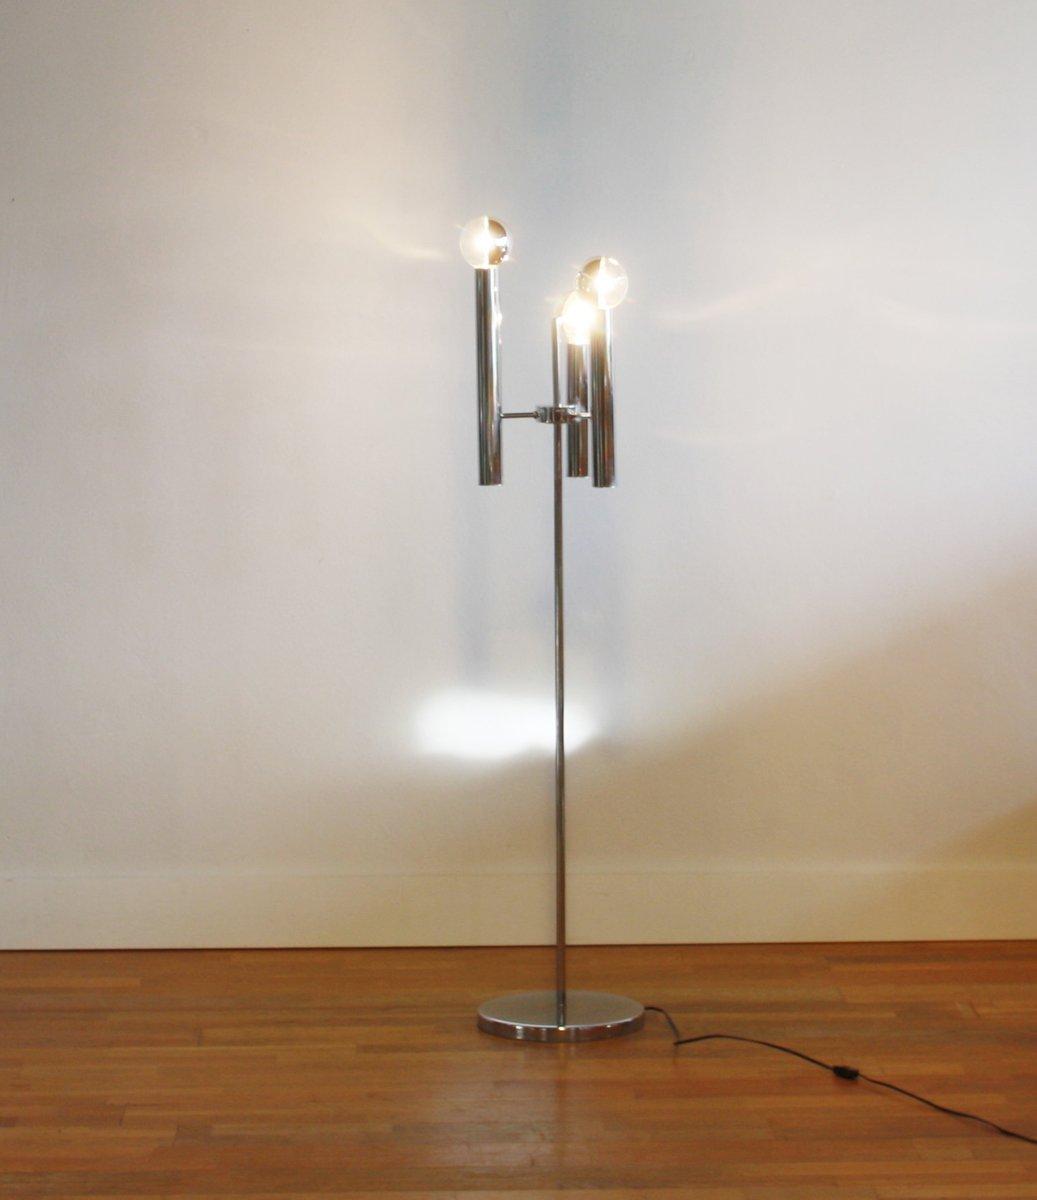 Italian Floor Lamp with Three Bulbs, 1950s for sale at Pamono